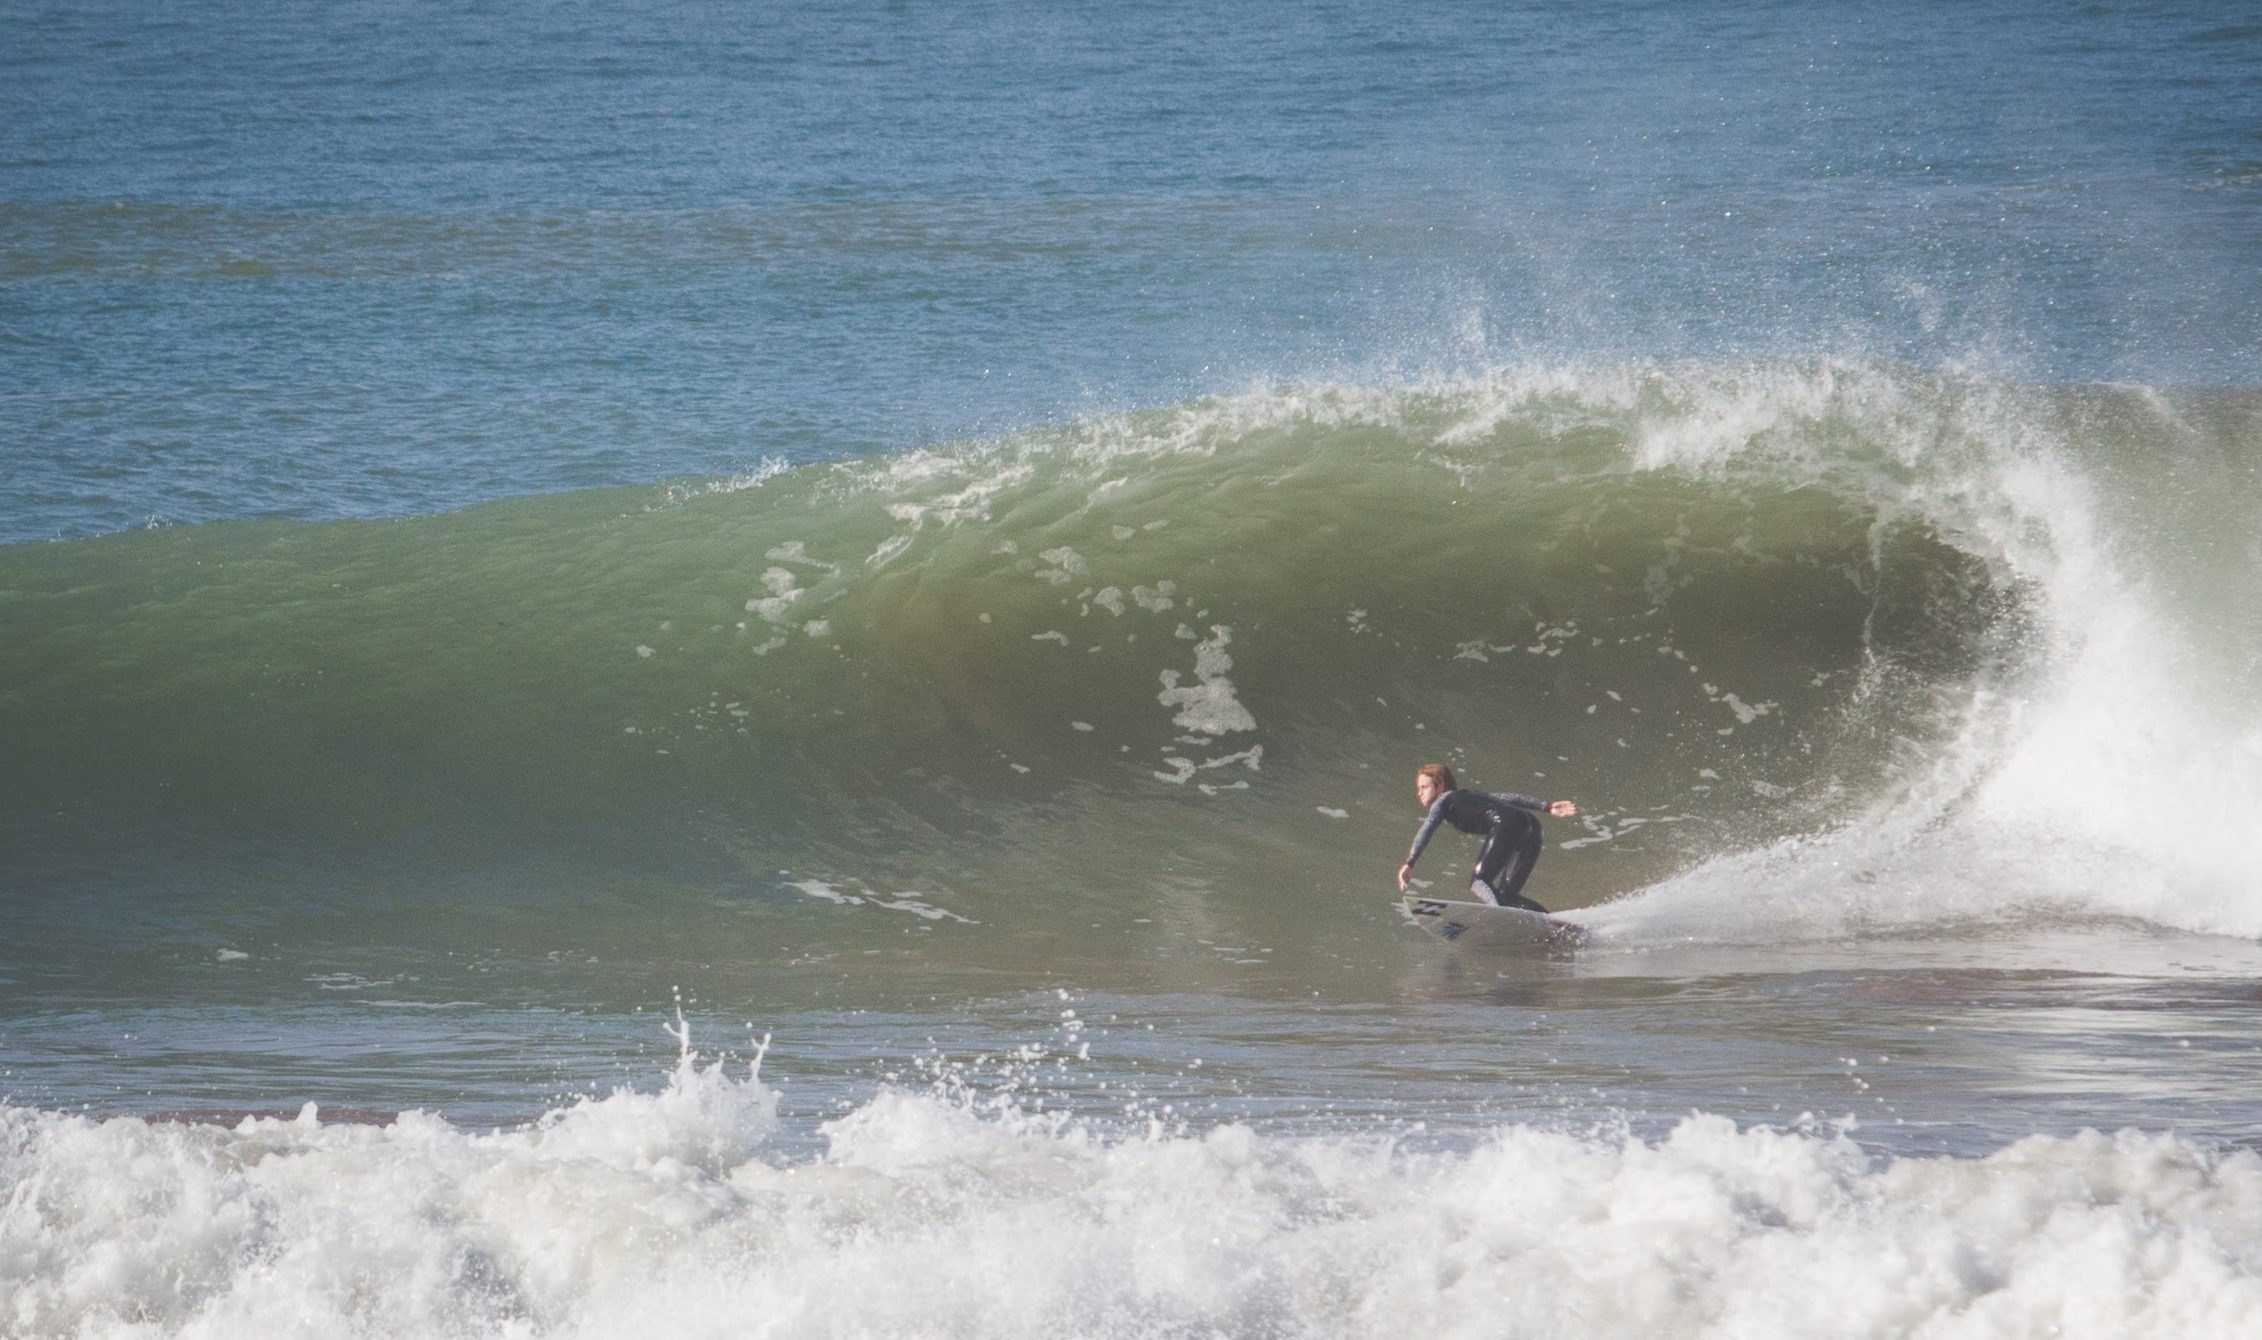 Grace Doyle. Shredding in Ireland.  Billabong Team Rider. Female Pro Surfer.